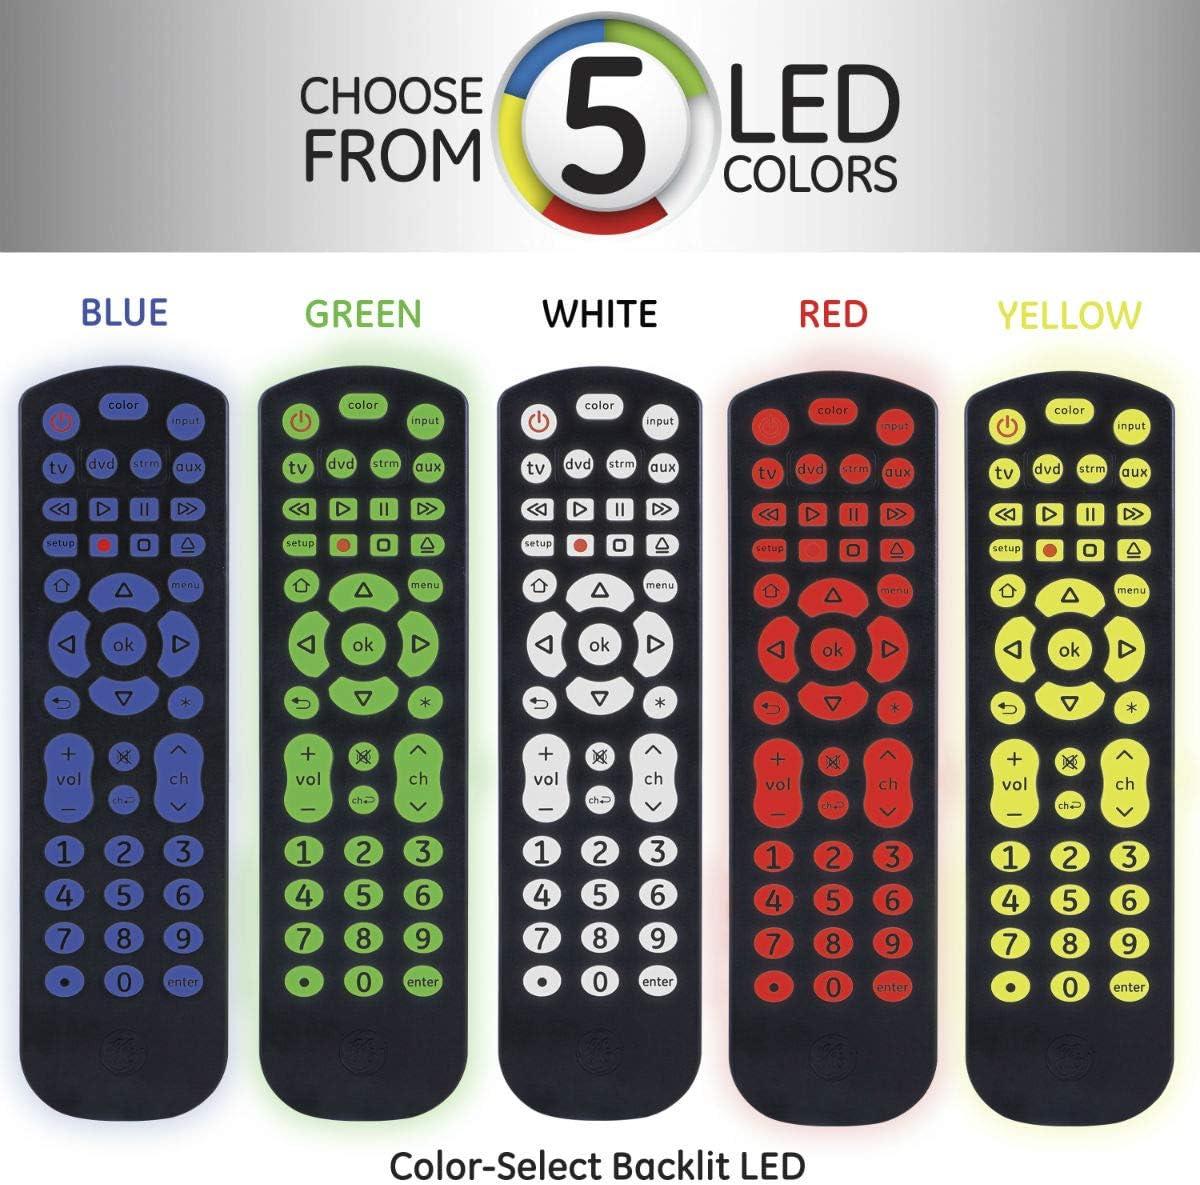 GE Universal Remote Control, Color Select Backlit, For Samsung, Vizio, LG, Sony, Sharp, Roku, Apple TV, RCA, Panasonic, Smart TVs, Streaming Players, Blu-Ray, DVD, Simple Setup, 4-Device, Black, 44220